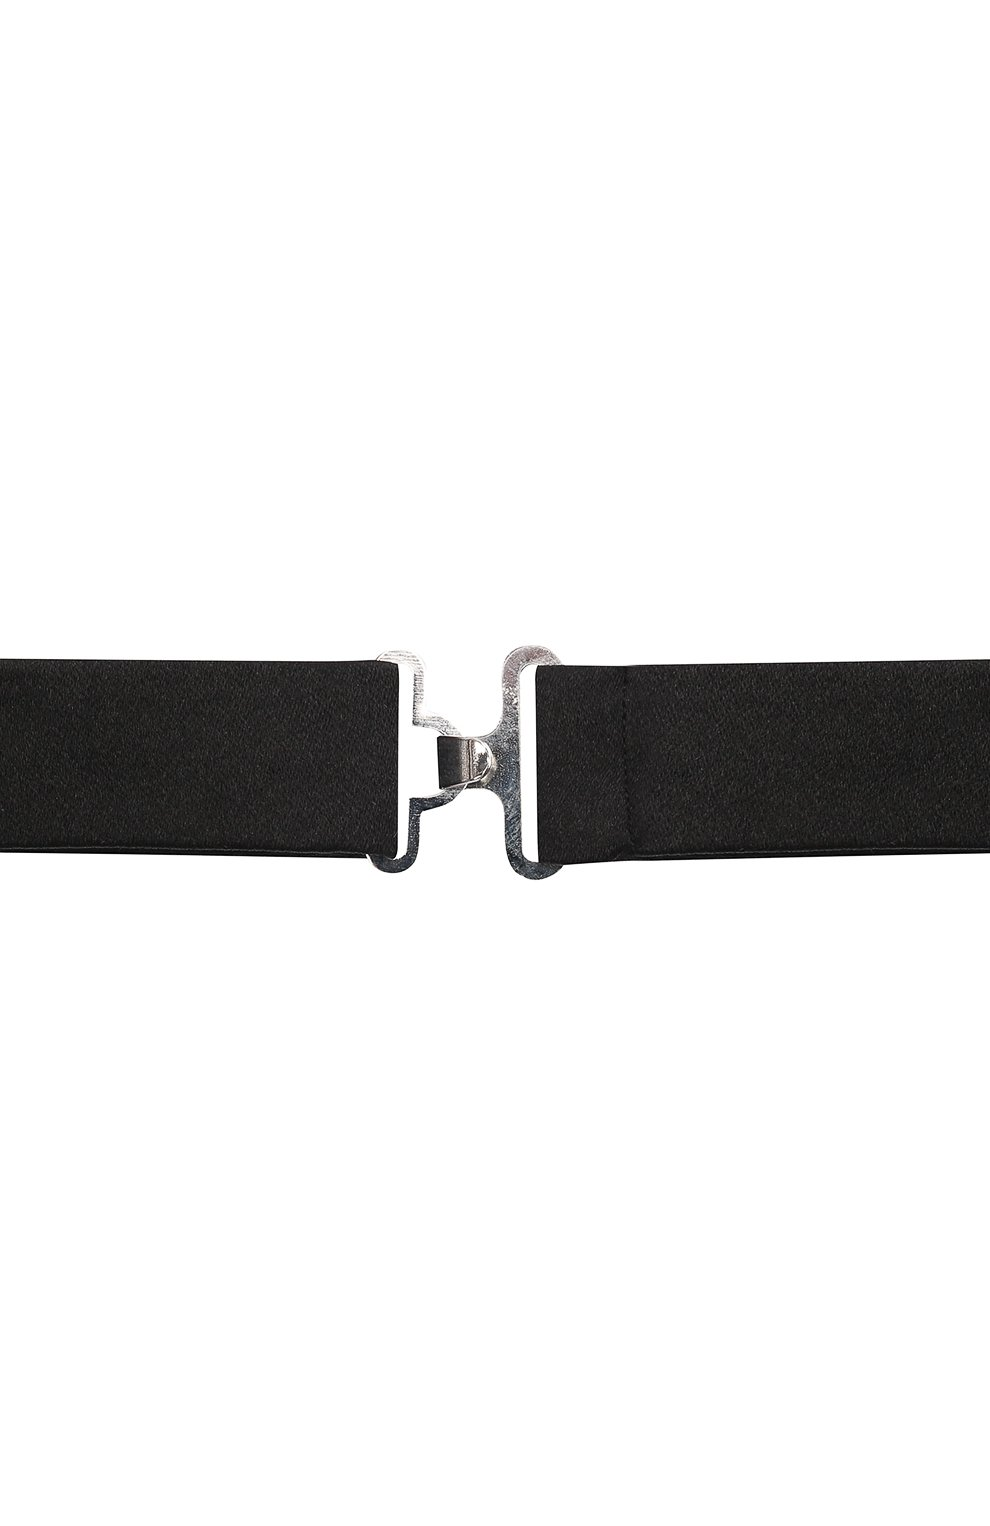 Мужской комплект из галстука-бабочки и камербанда CANALI черного цвета, арт. 55/HJ00040 | Фото 5